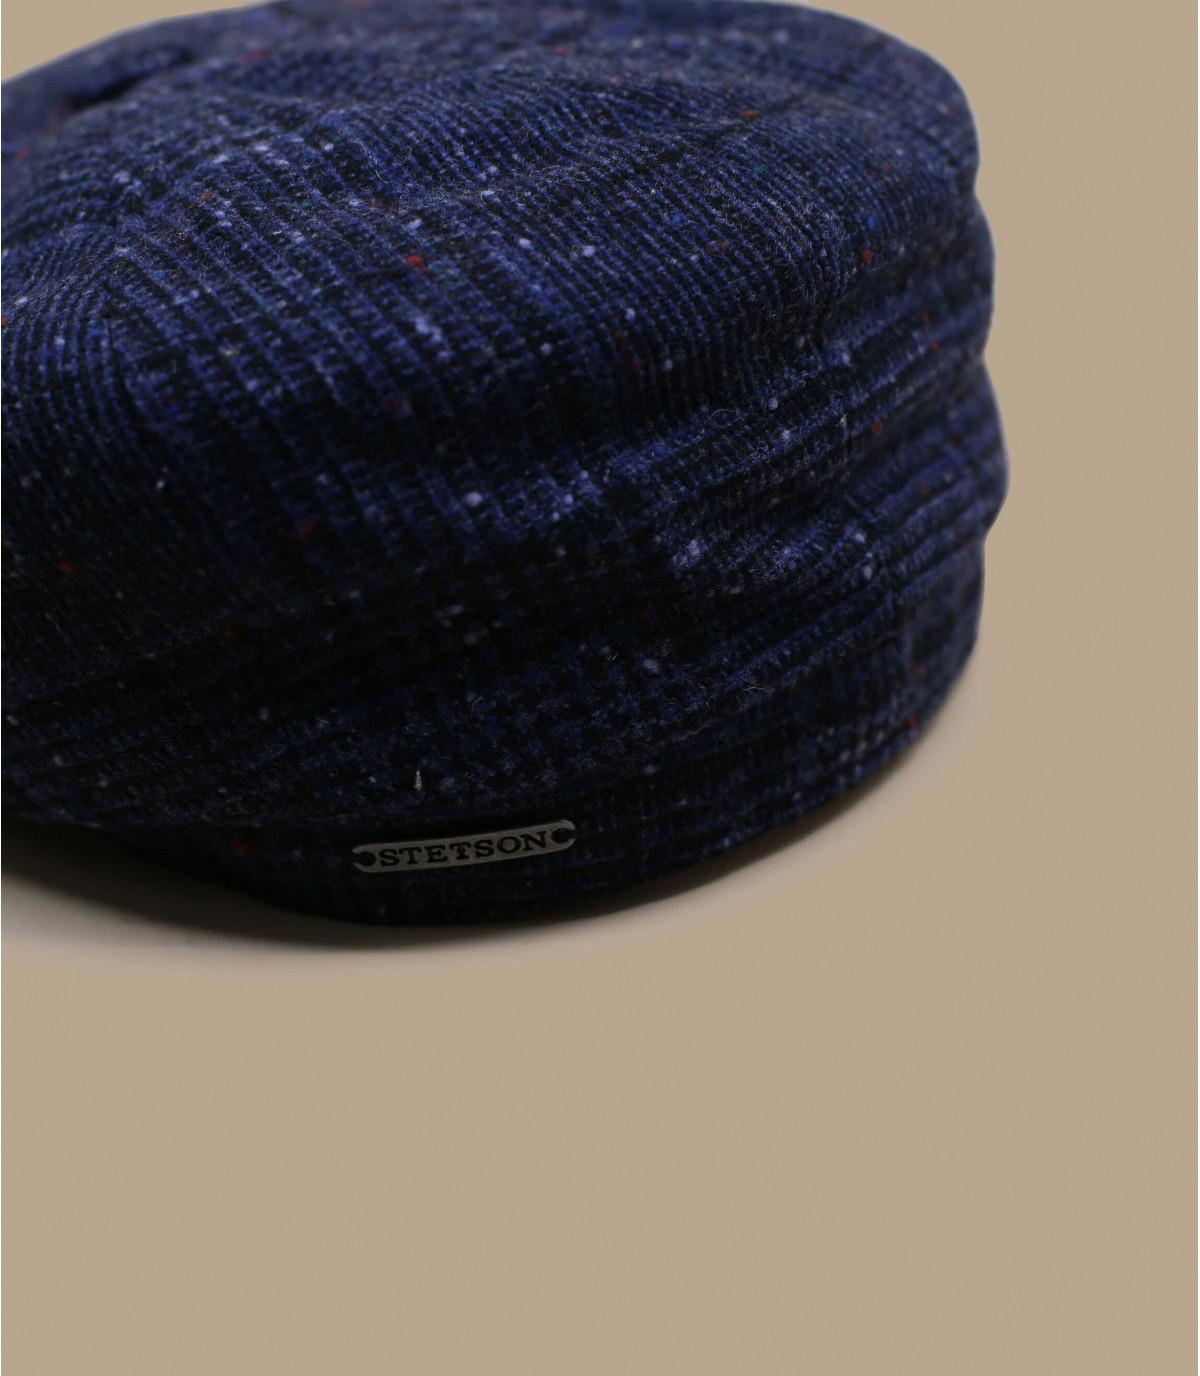 Details Hatteras Wool blue check - afbeeling 2